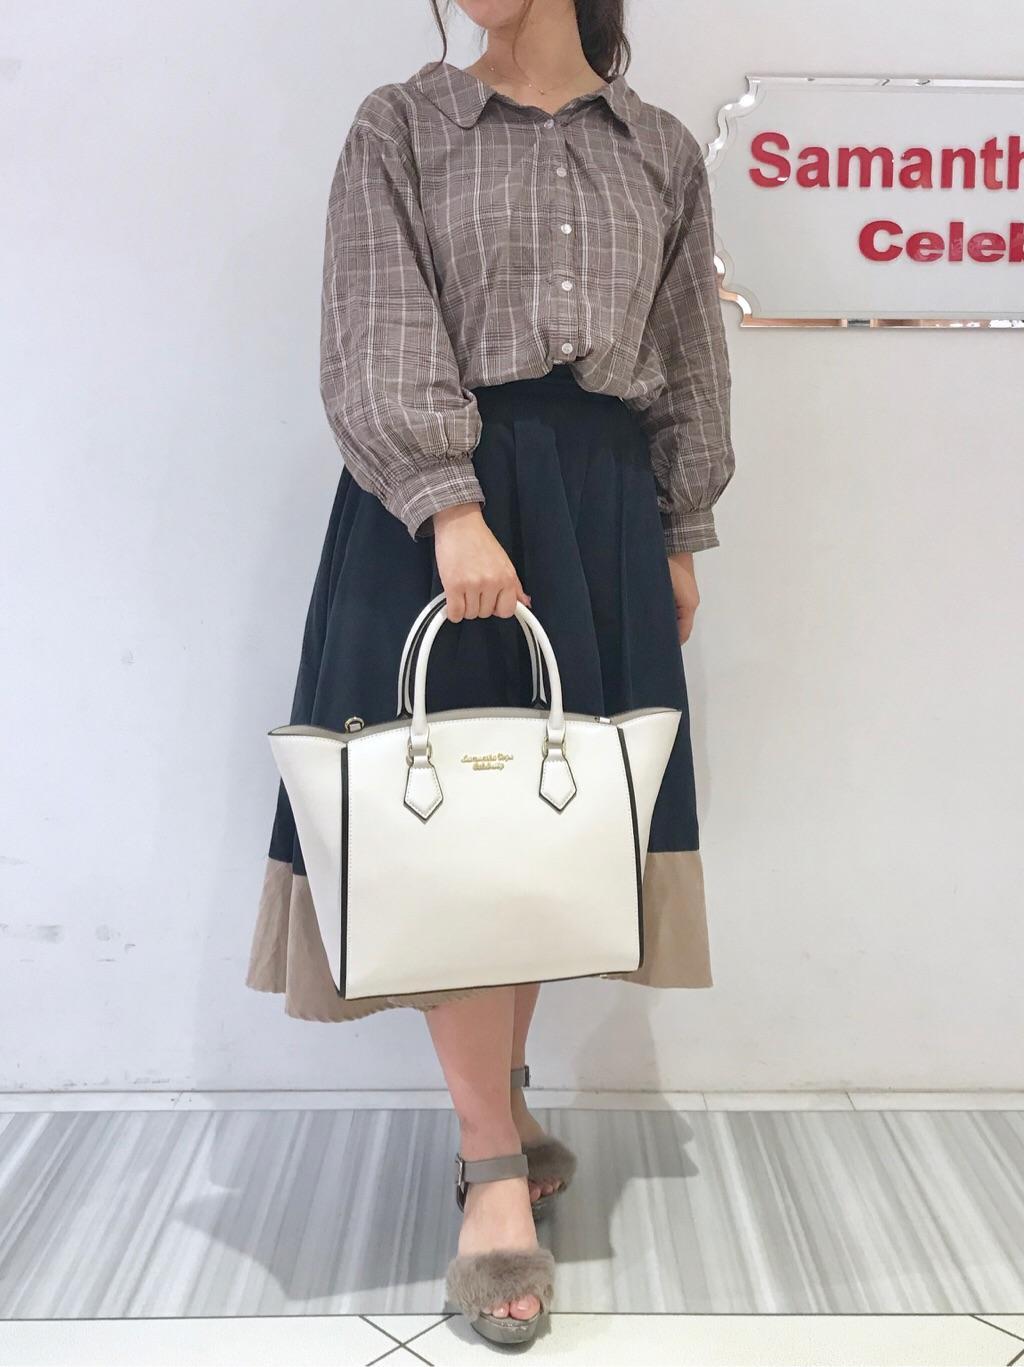 SAMANTHAVEGA Celebrity 福岡パルコ店 nagisa